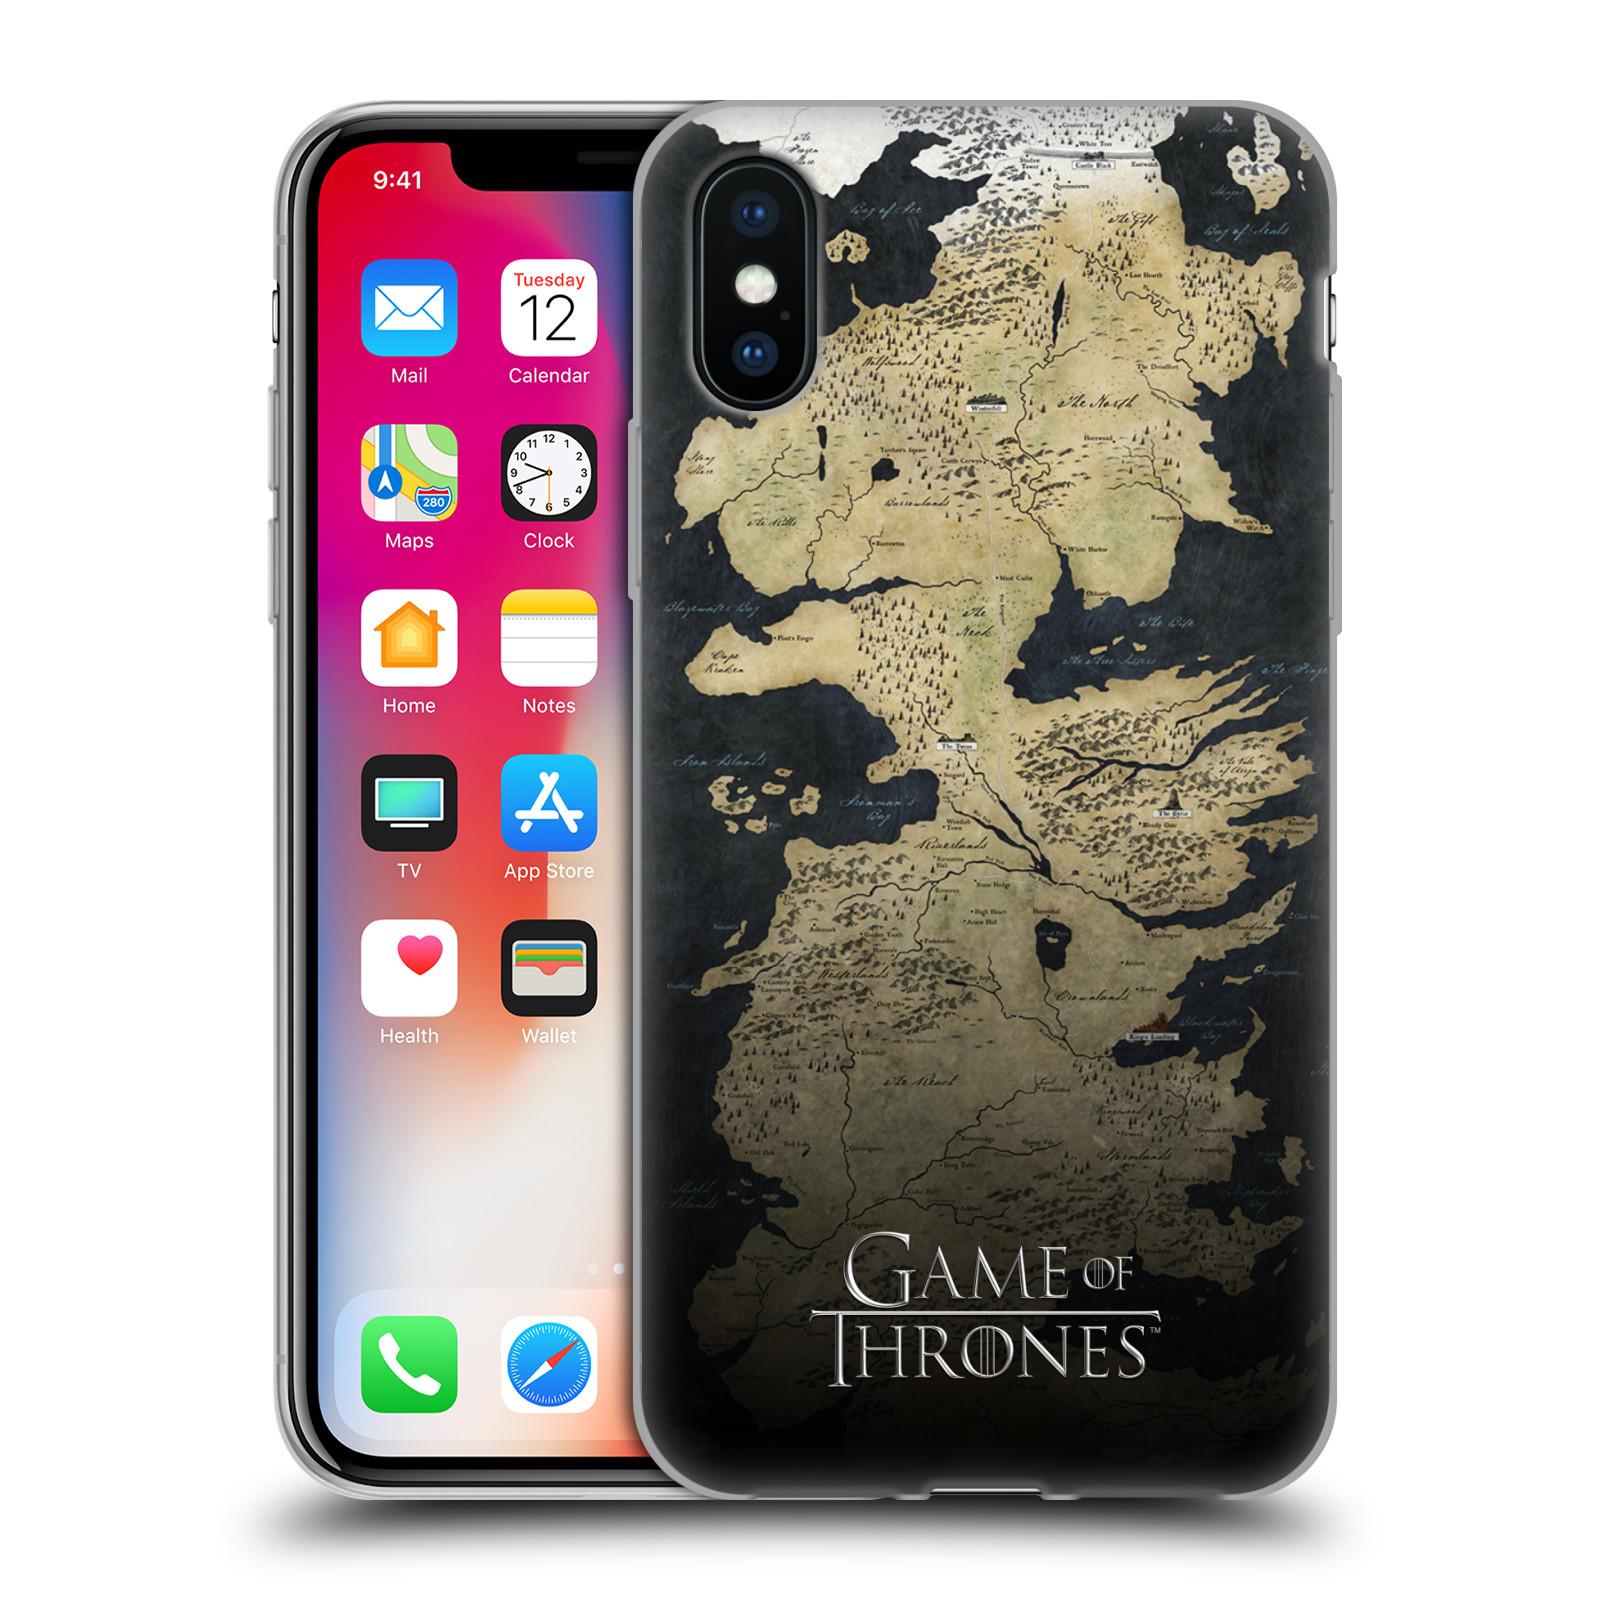 Silikonové pouzdro na mobil Apple iPhone X - Head Case - Hra o trůny - Mapa  západozemí 2ac355eed71